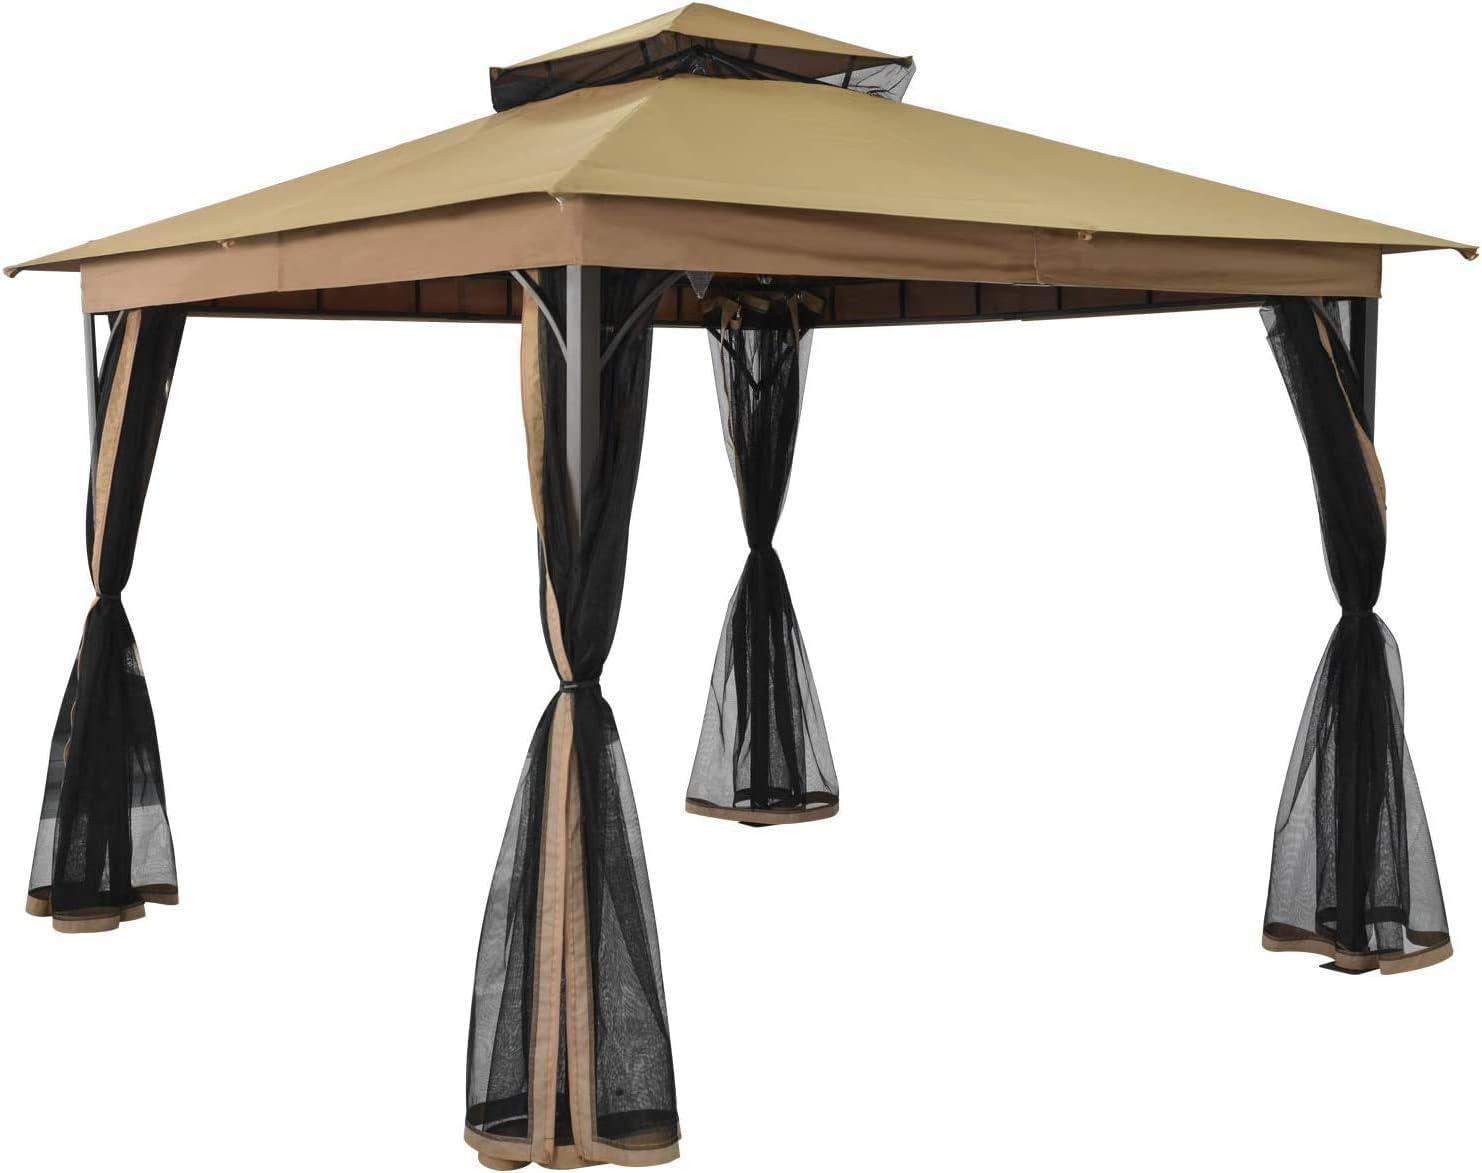 SUNA OUTDOOR 10 x ft 店内全品対象 Gazebo Outdoor Dut Heavy 爆買い新作 Shelter Canopy